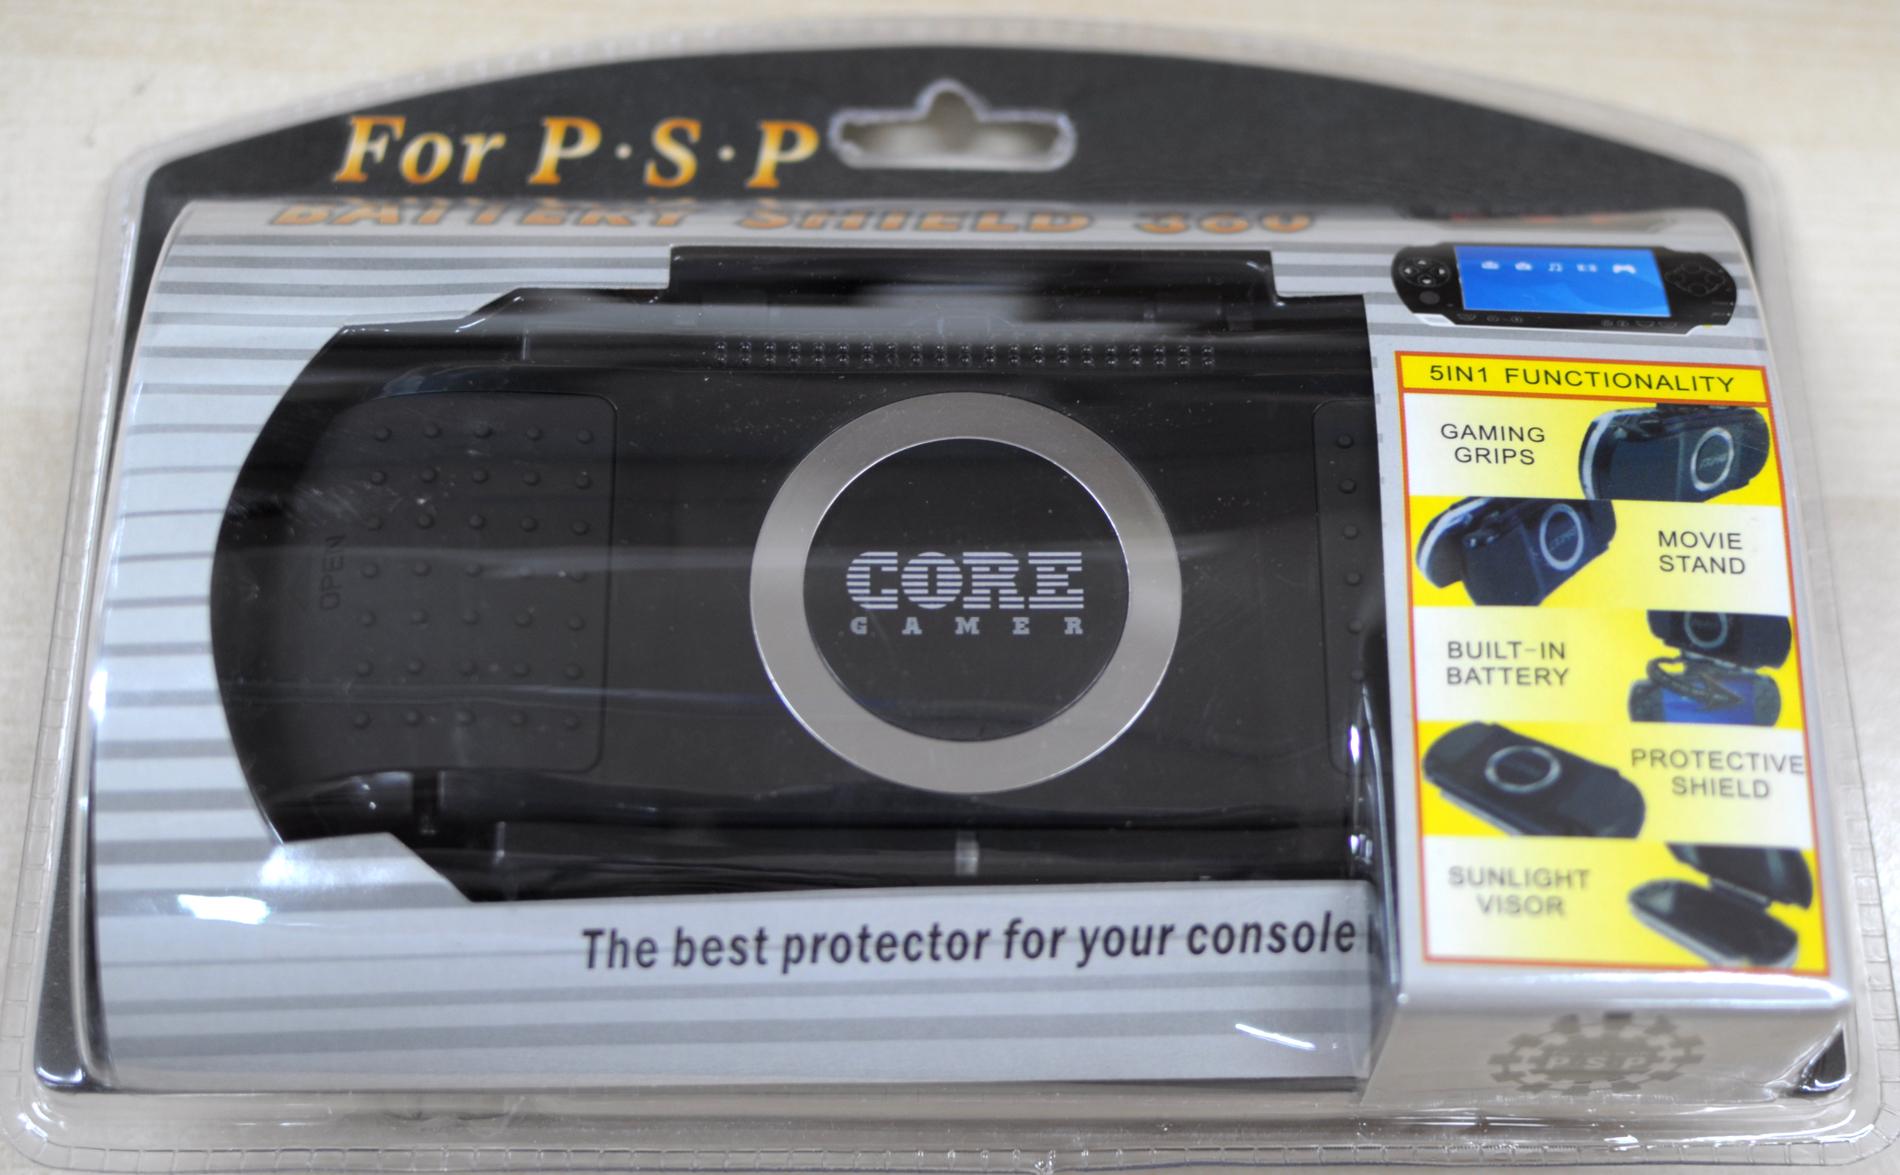 PSP Battery shield 360 - PSP Battery shield 360  5 funciones en 1 solo prodcuto: 1. Protector consola 2. Bateria Litio-Ion 3. Protector solar 4. Movie Stand 5. Game Grips